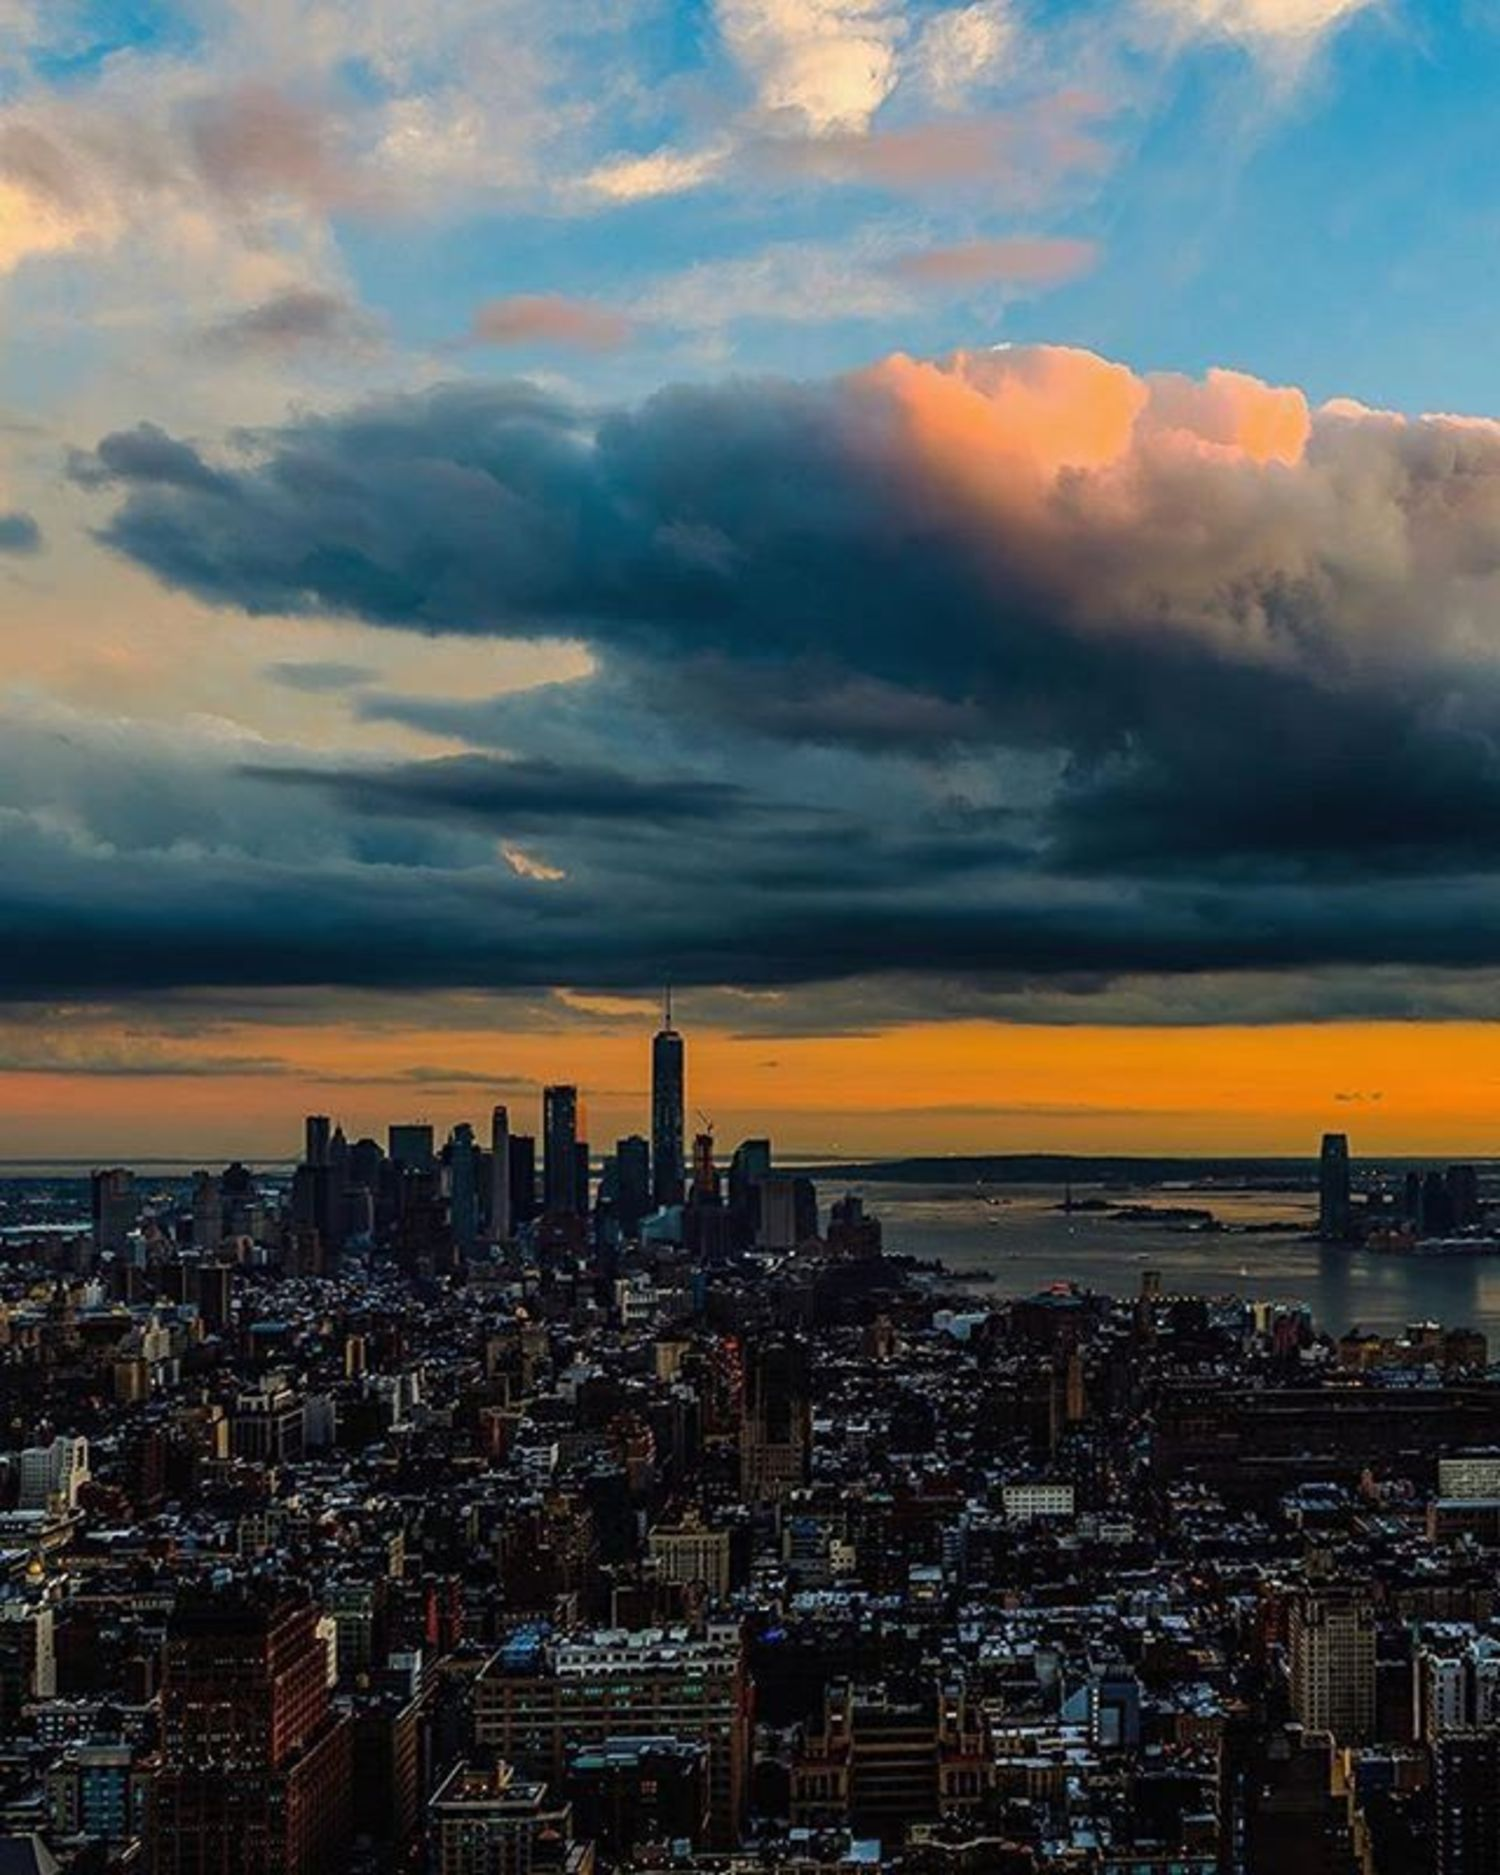 New York, New York. Photo via @grimace_586 #viewingnyc #newyorkcity #newyork